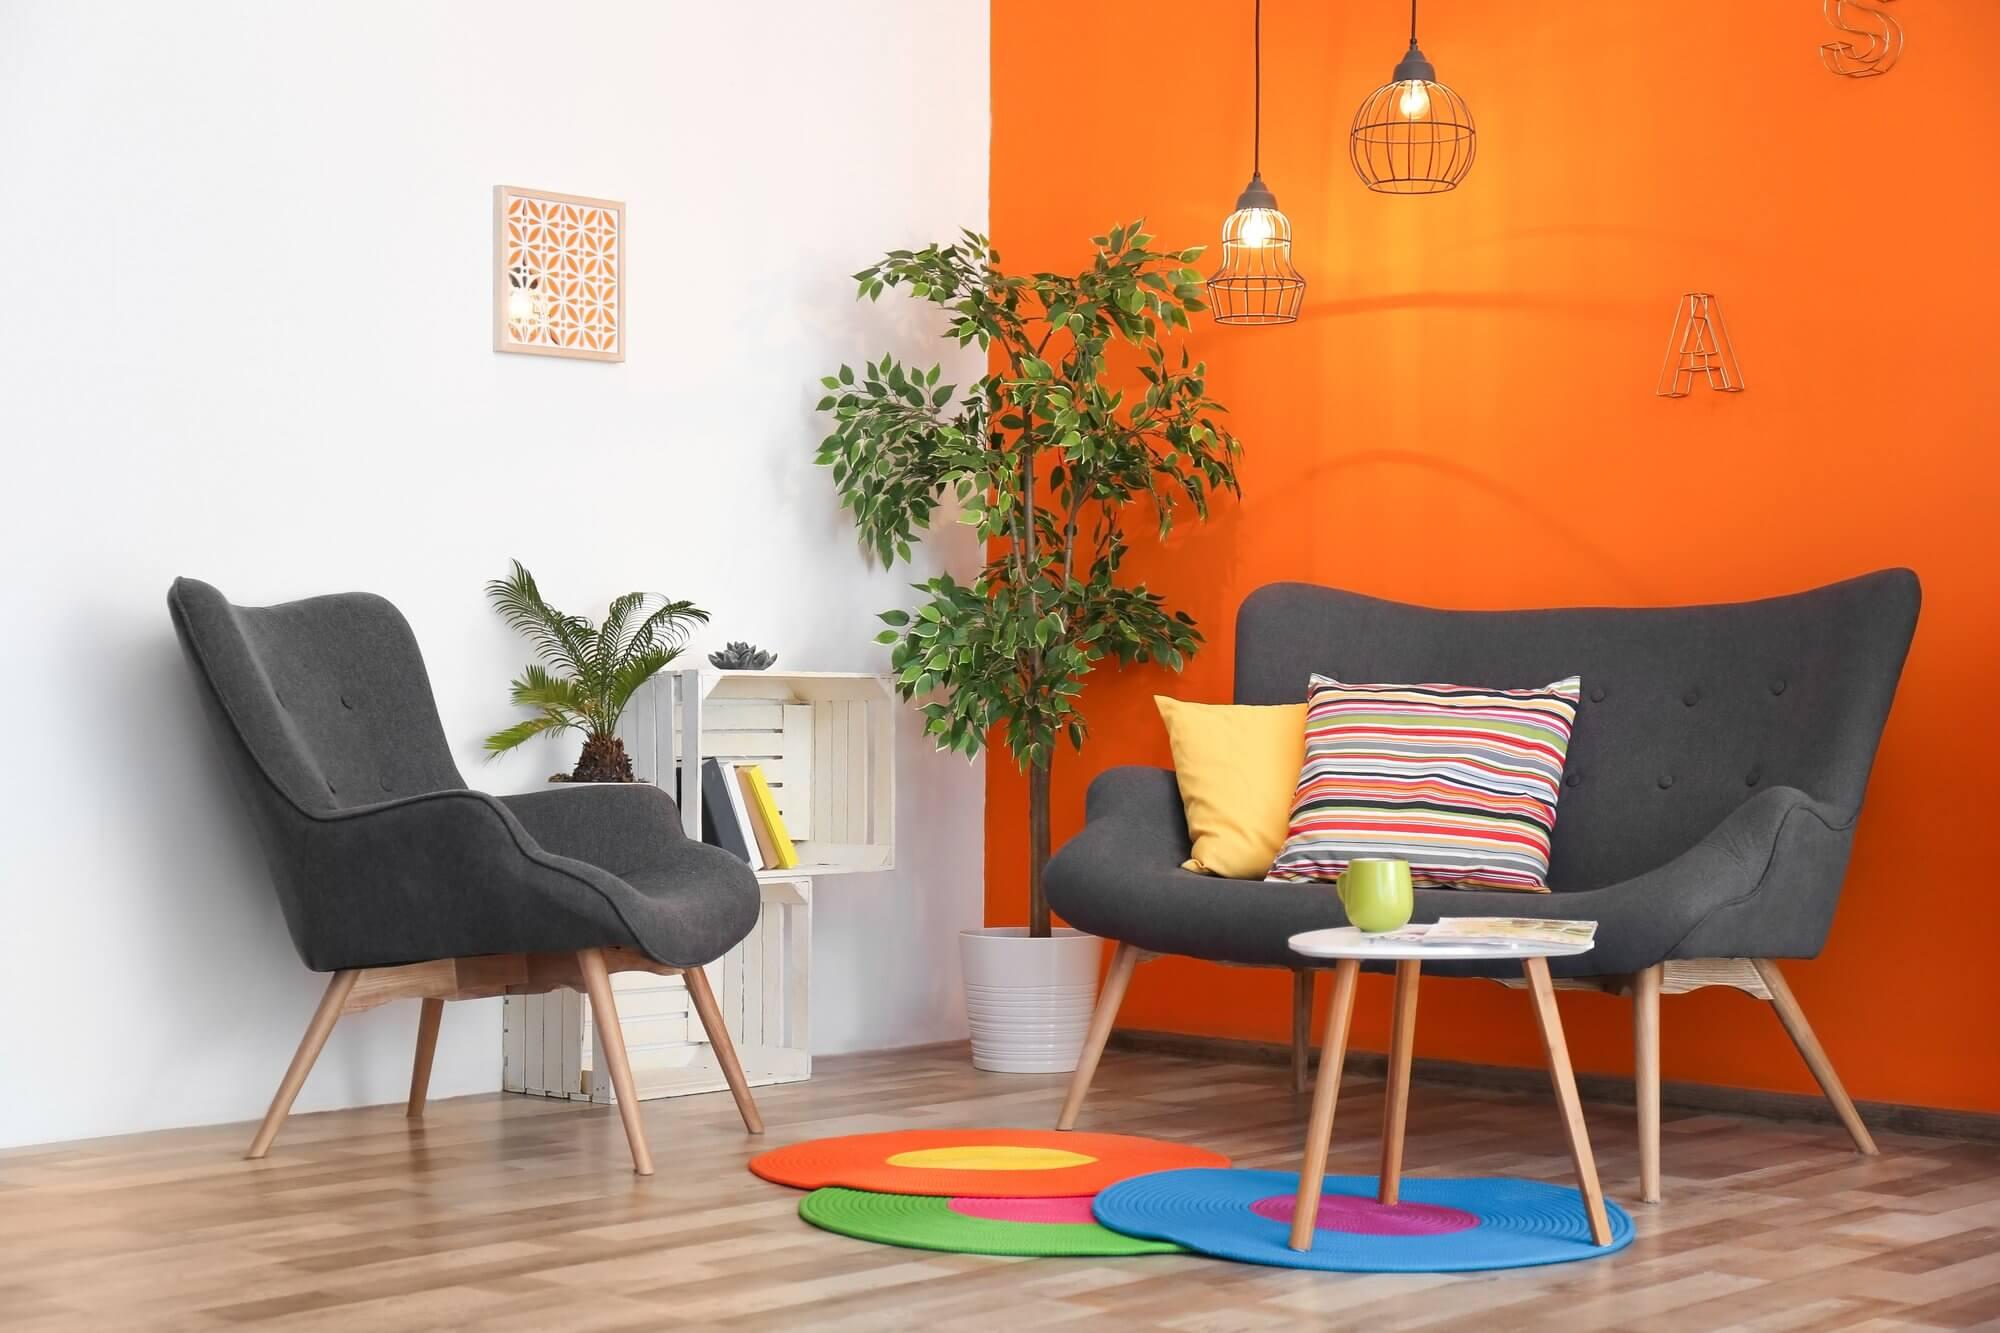 Orange & White Wall - Living Room Decor Ideas on A Budget